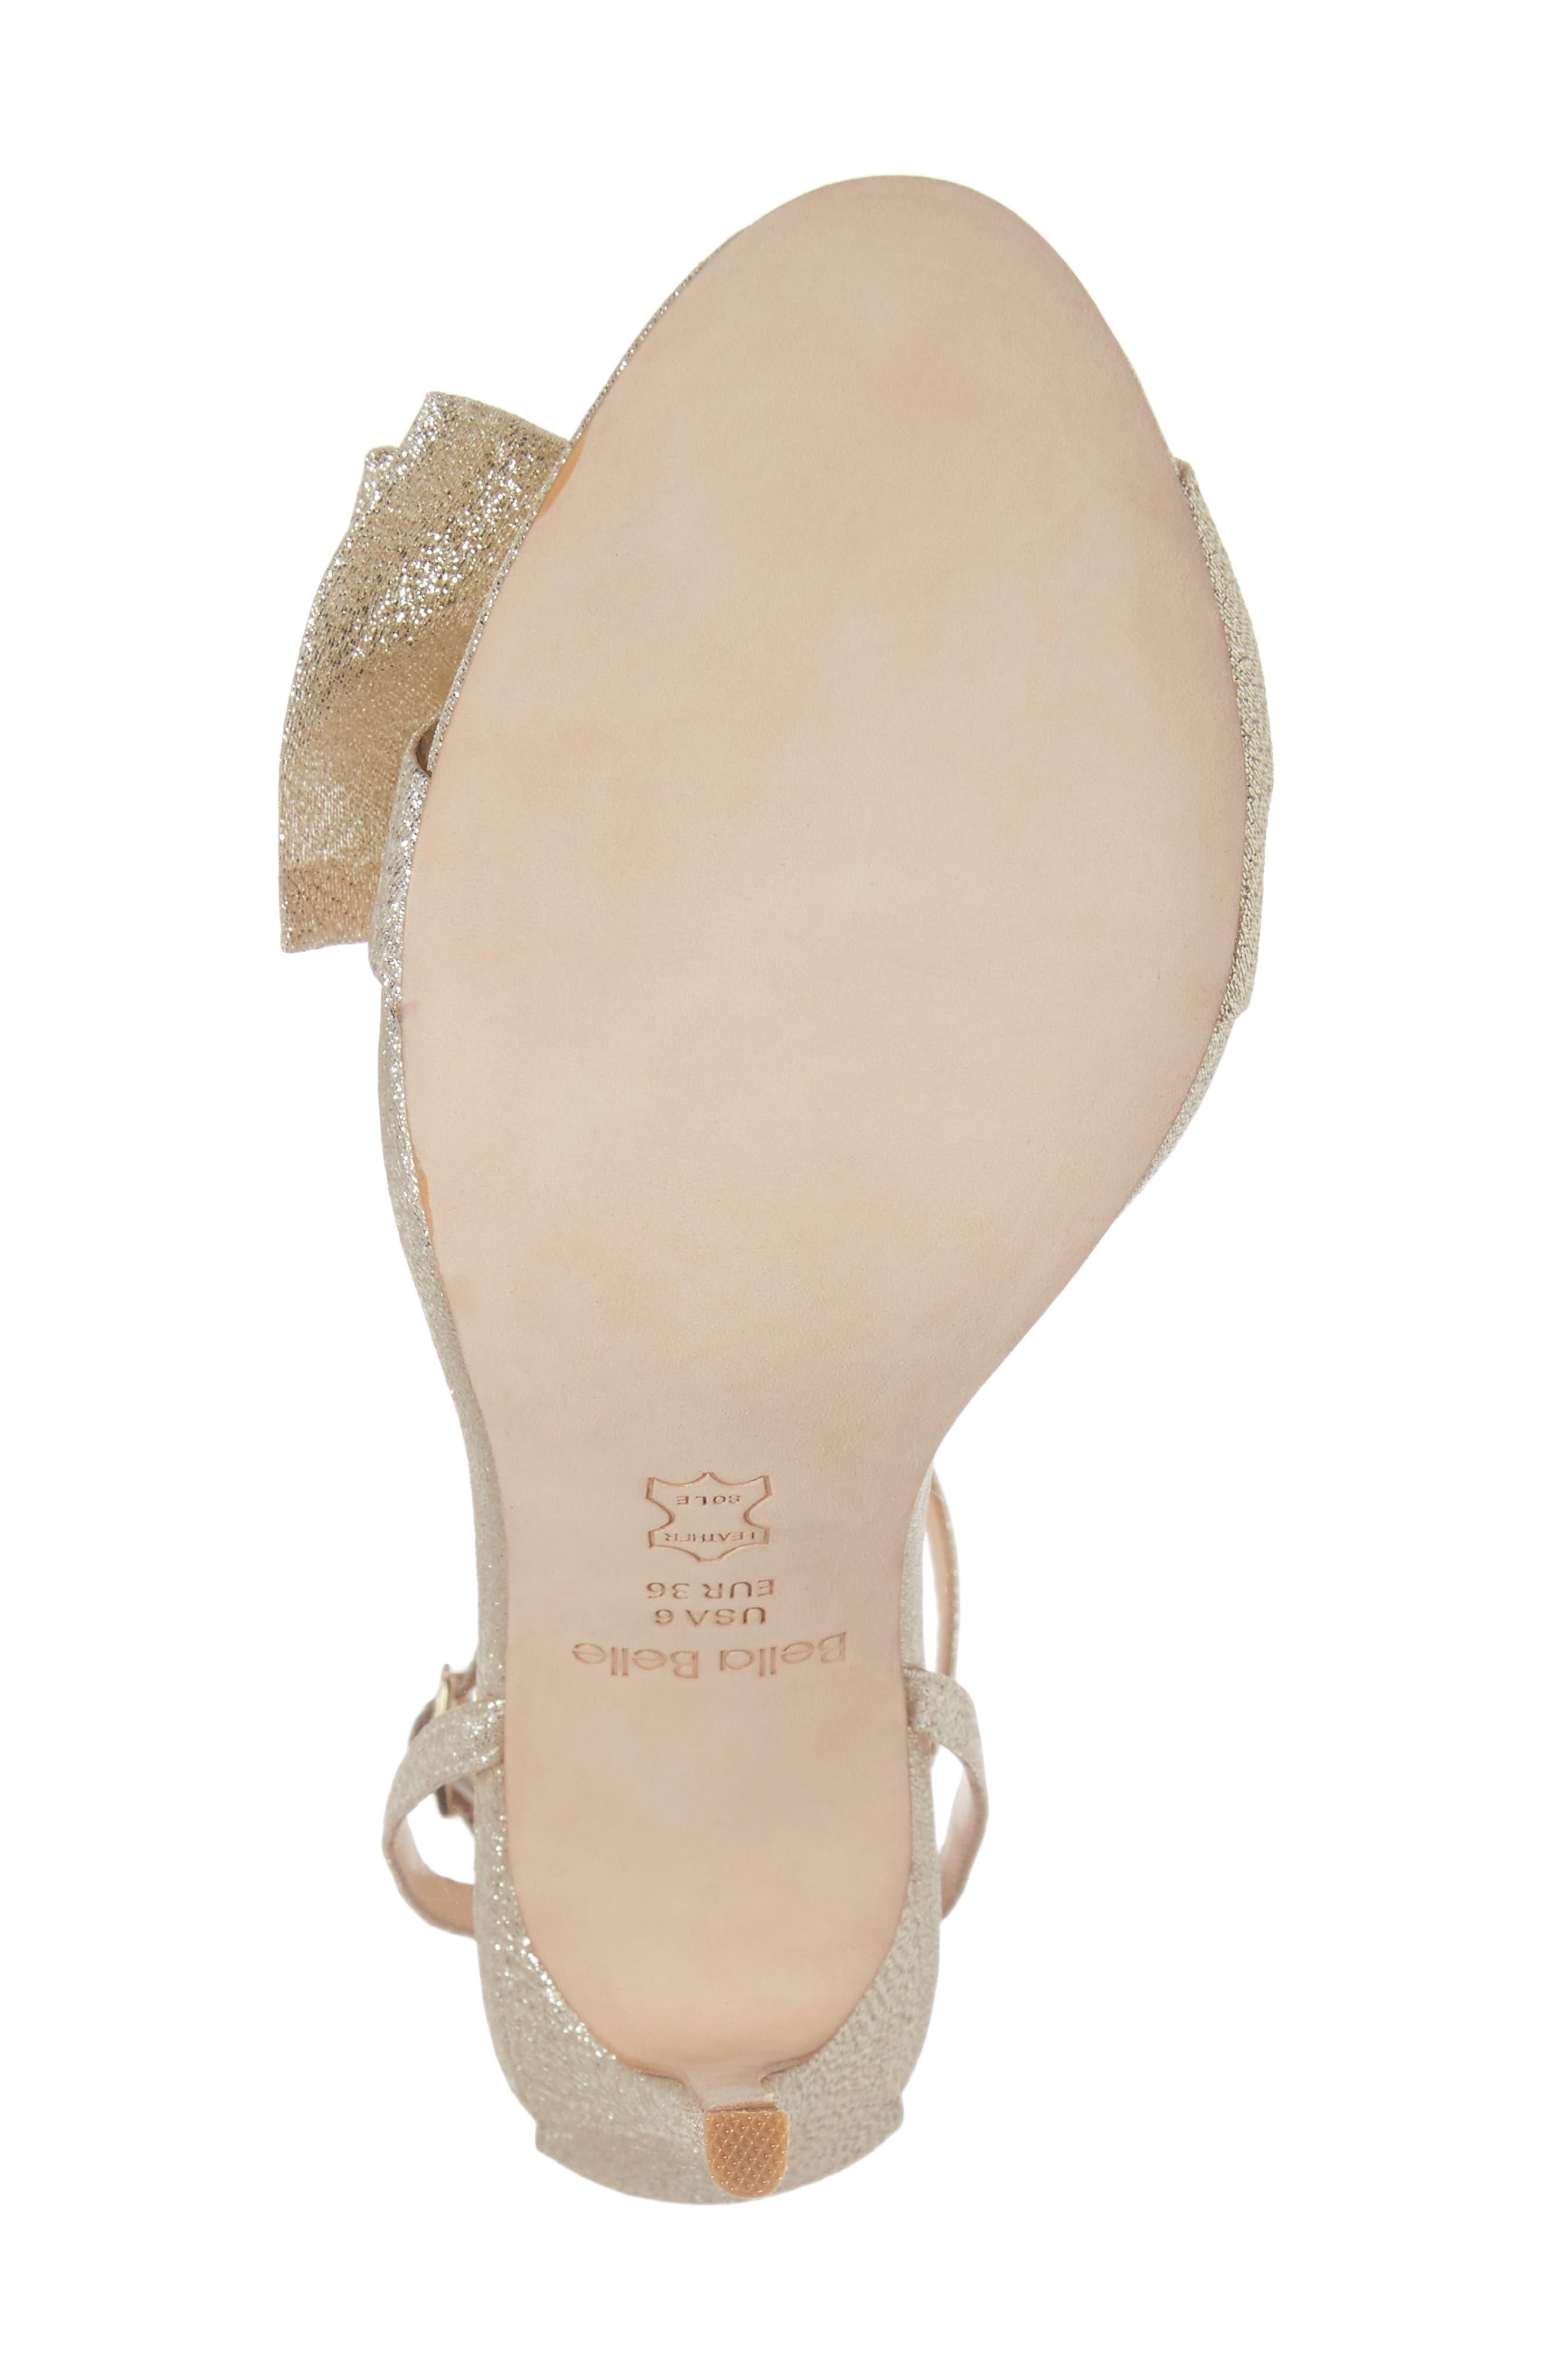 Aubrey Bow Ankle Strap Sandal,                             Alternate thumbnail 6, color,                             GOLD